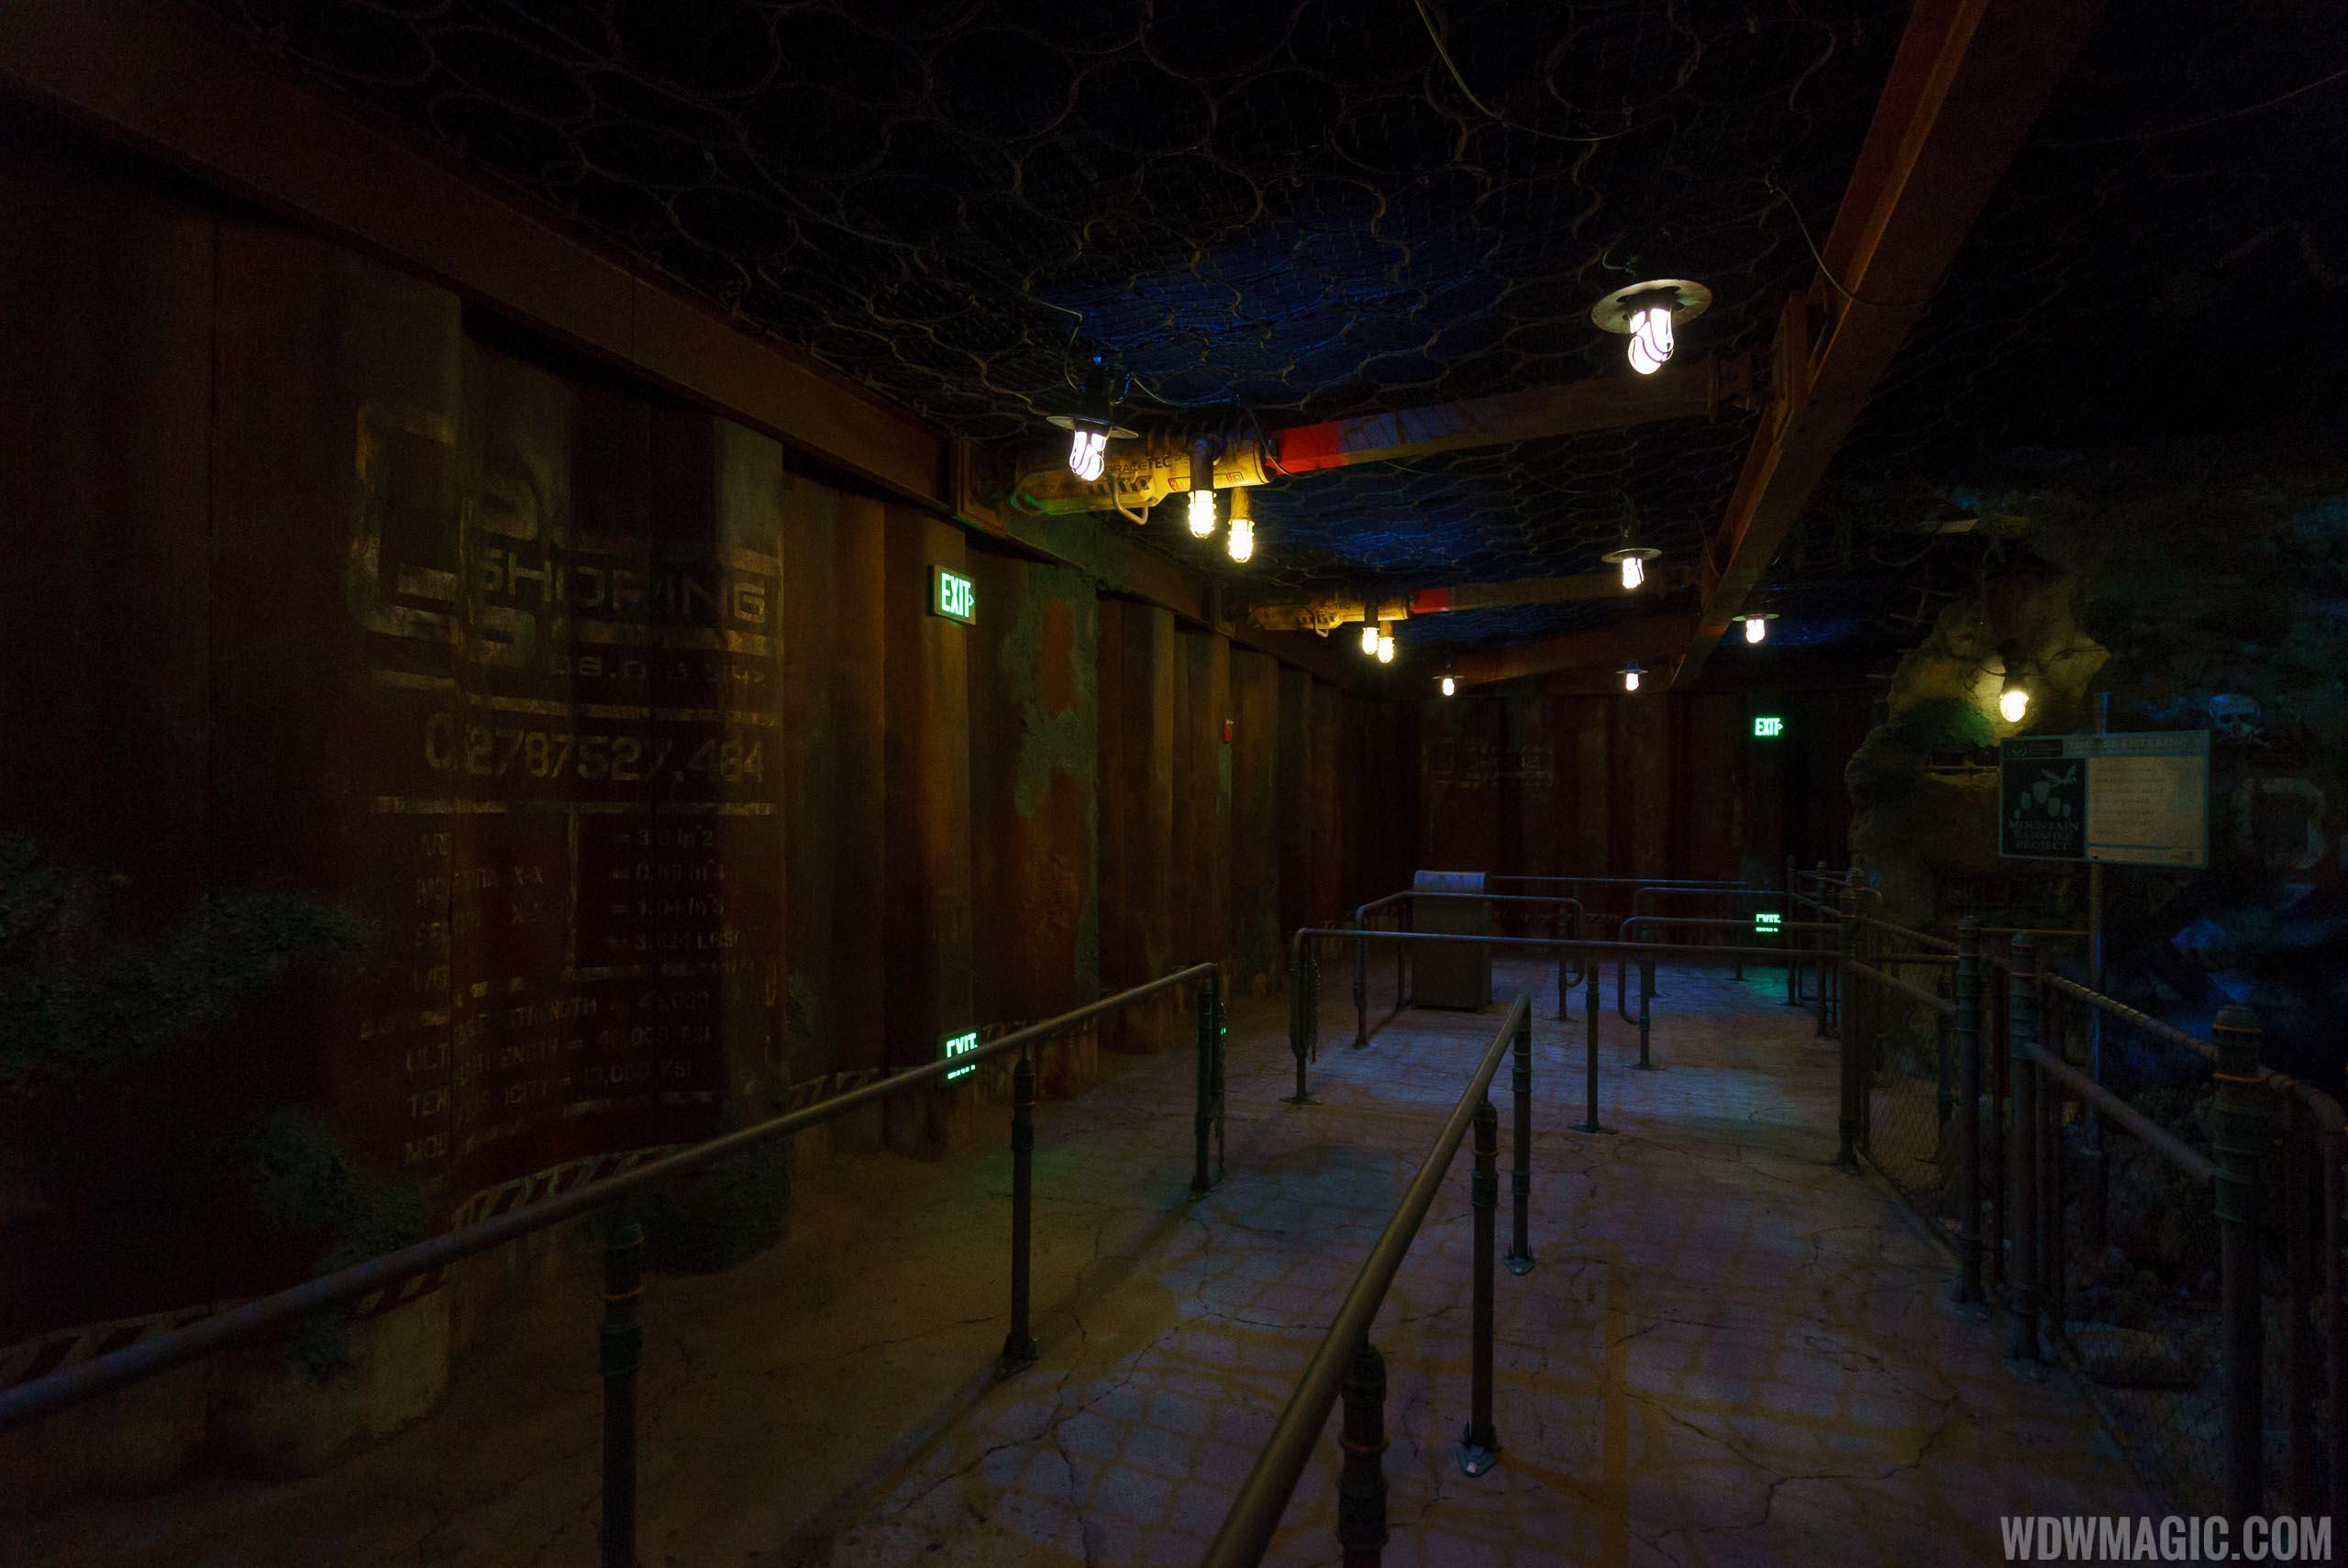 Avatar Flight of Passage queue - RDA facility